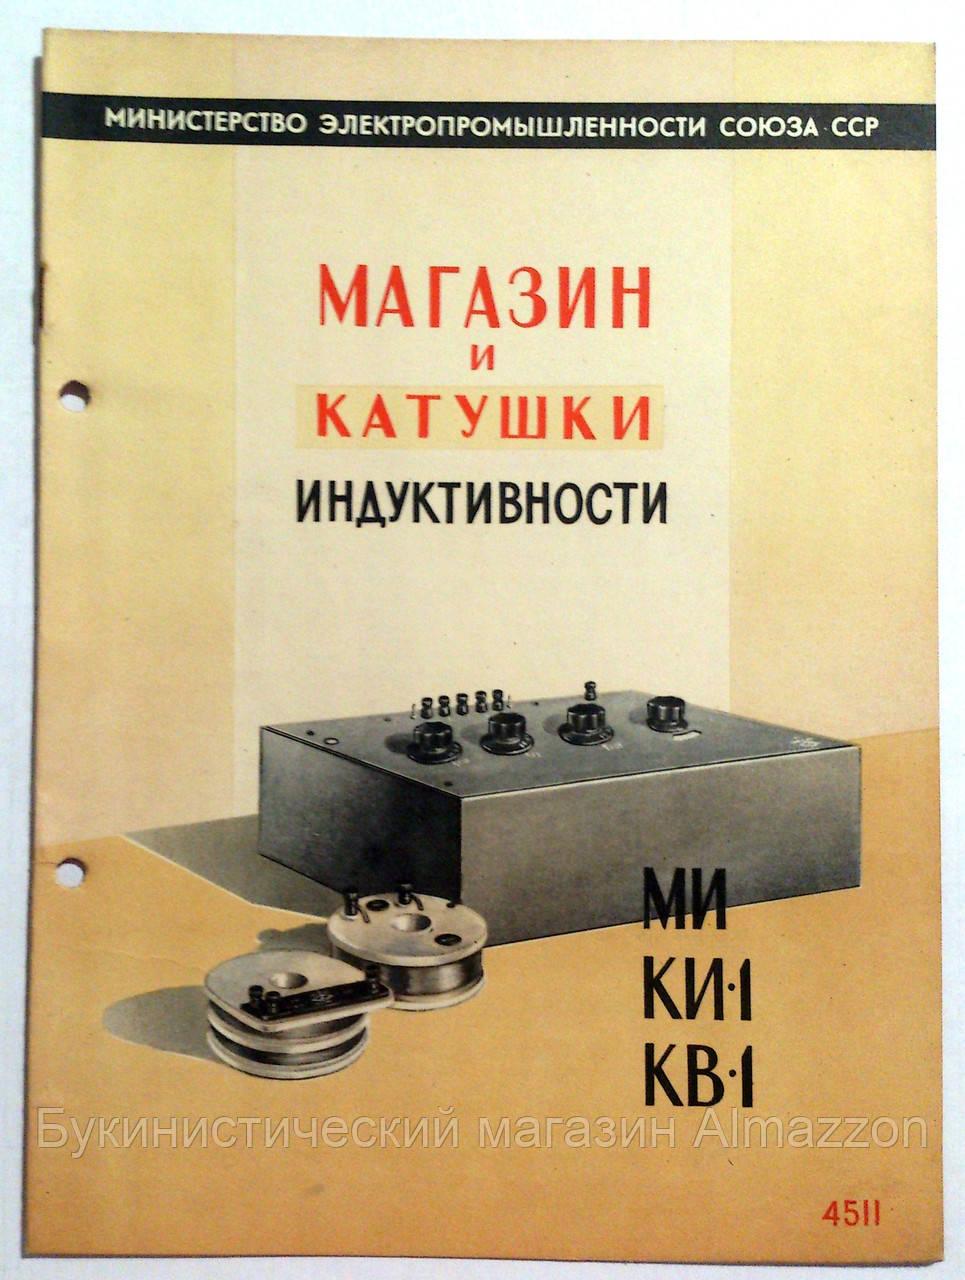 "Журнал (Бюллетень) ""Магазин и катушки индуктивности МИ, КИ-1, КВ-1"" 1952 год"